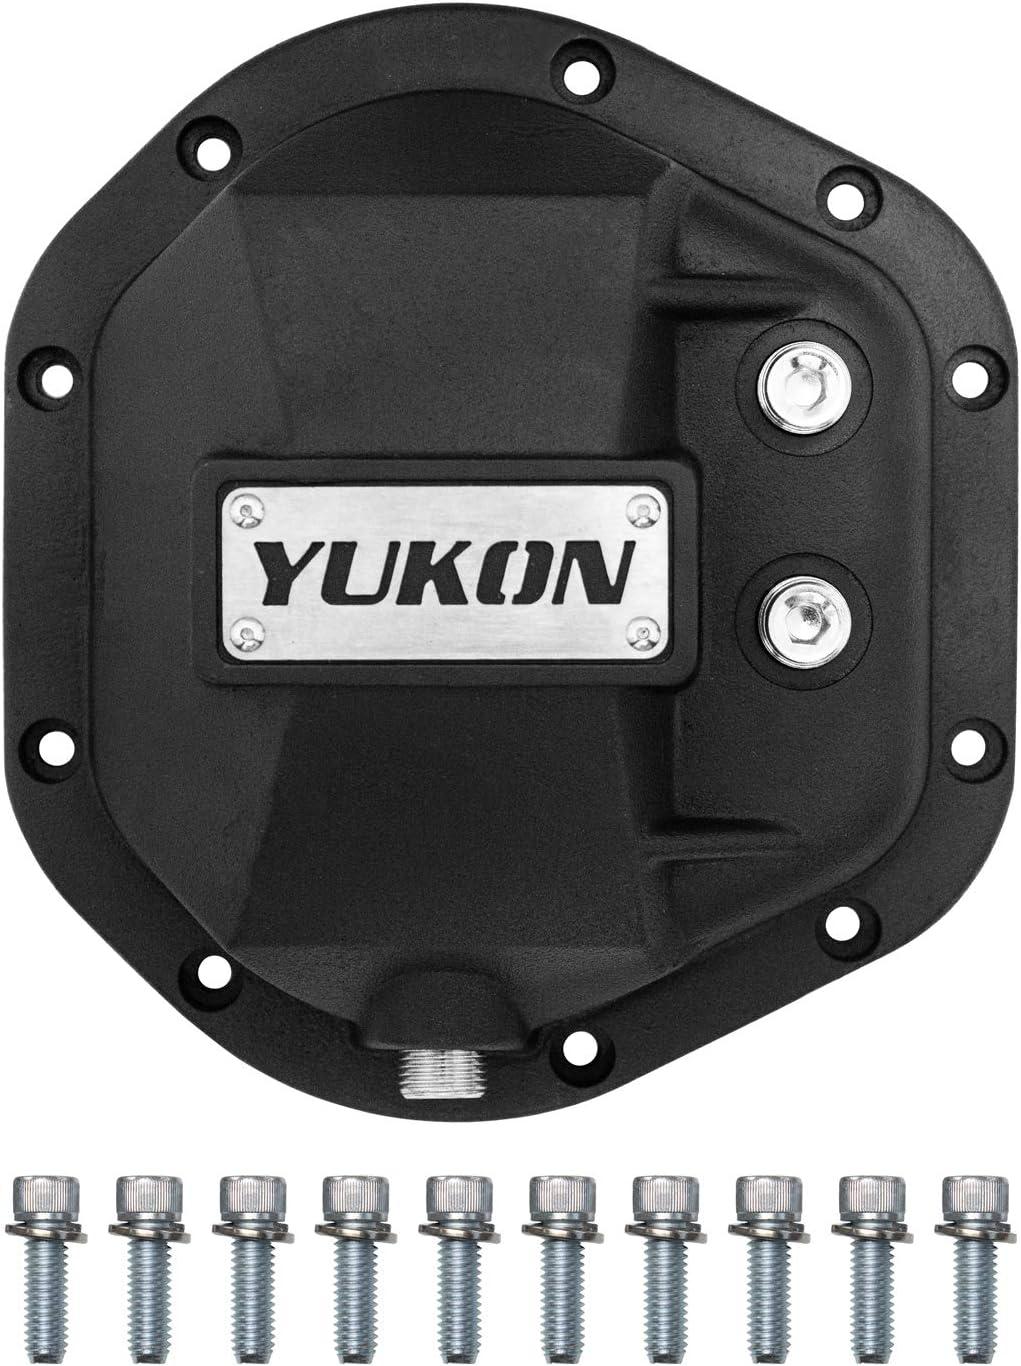 Yukon Gear & Axle YHCC-D44 Black Hardcore Nodular Iron Differential Cover